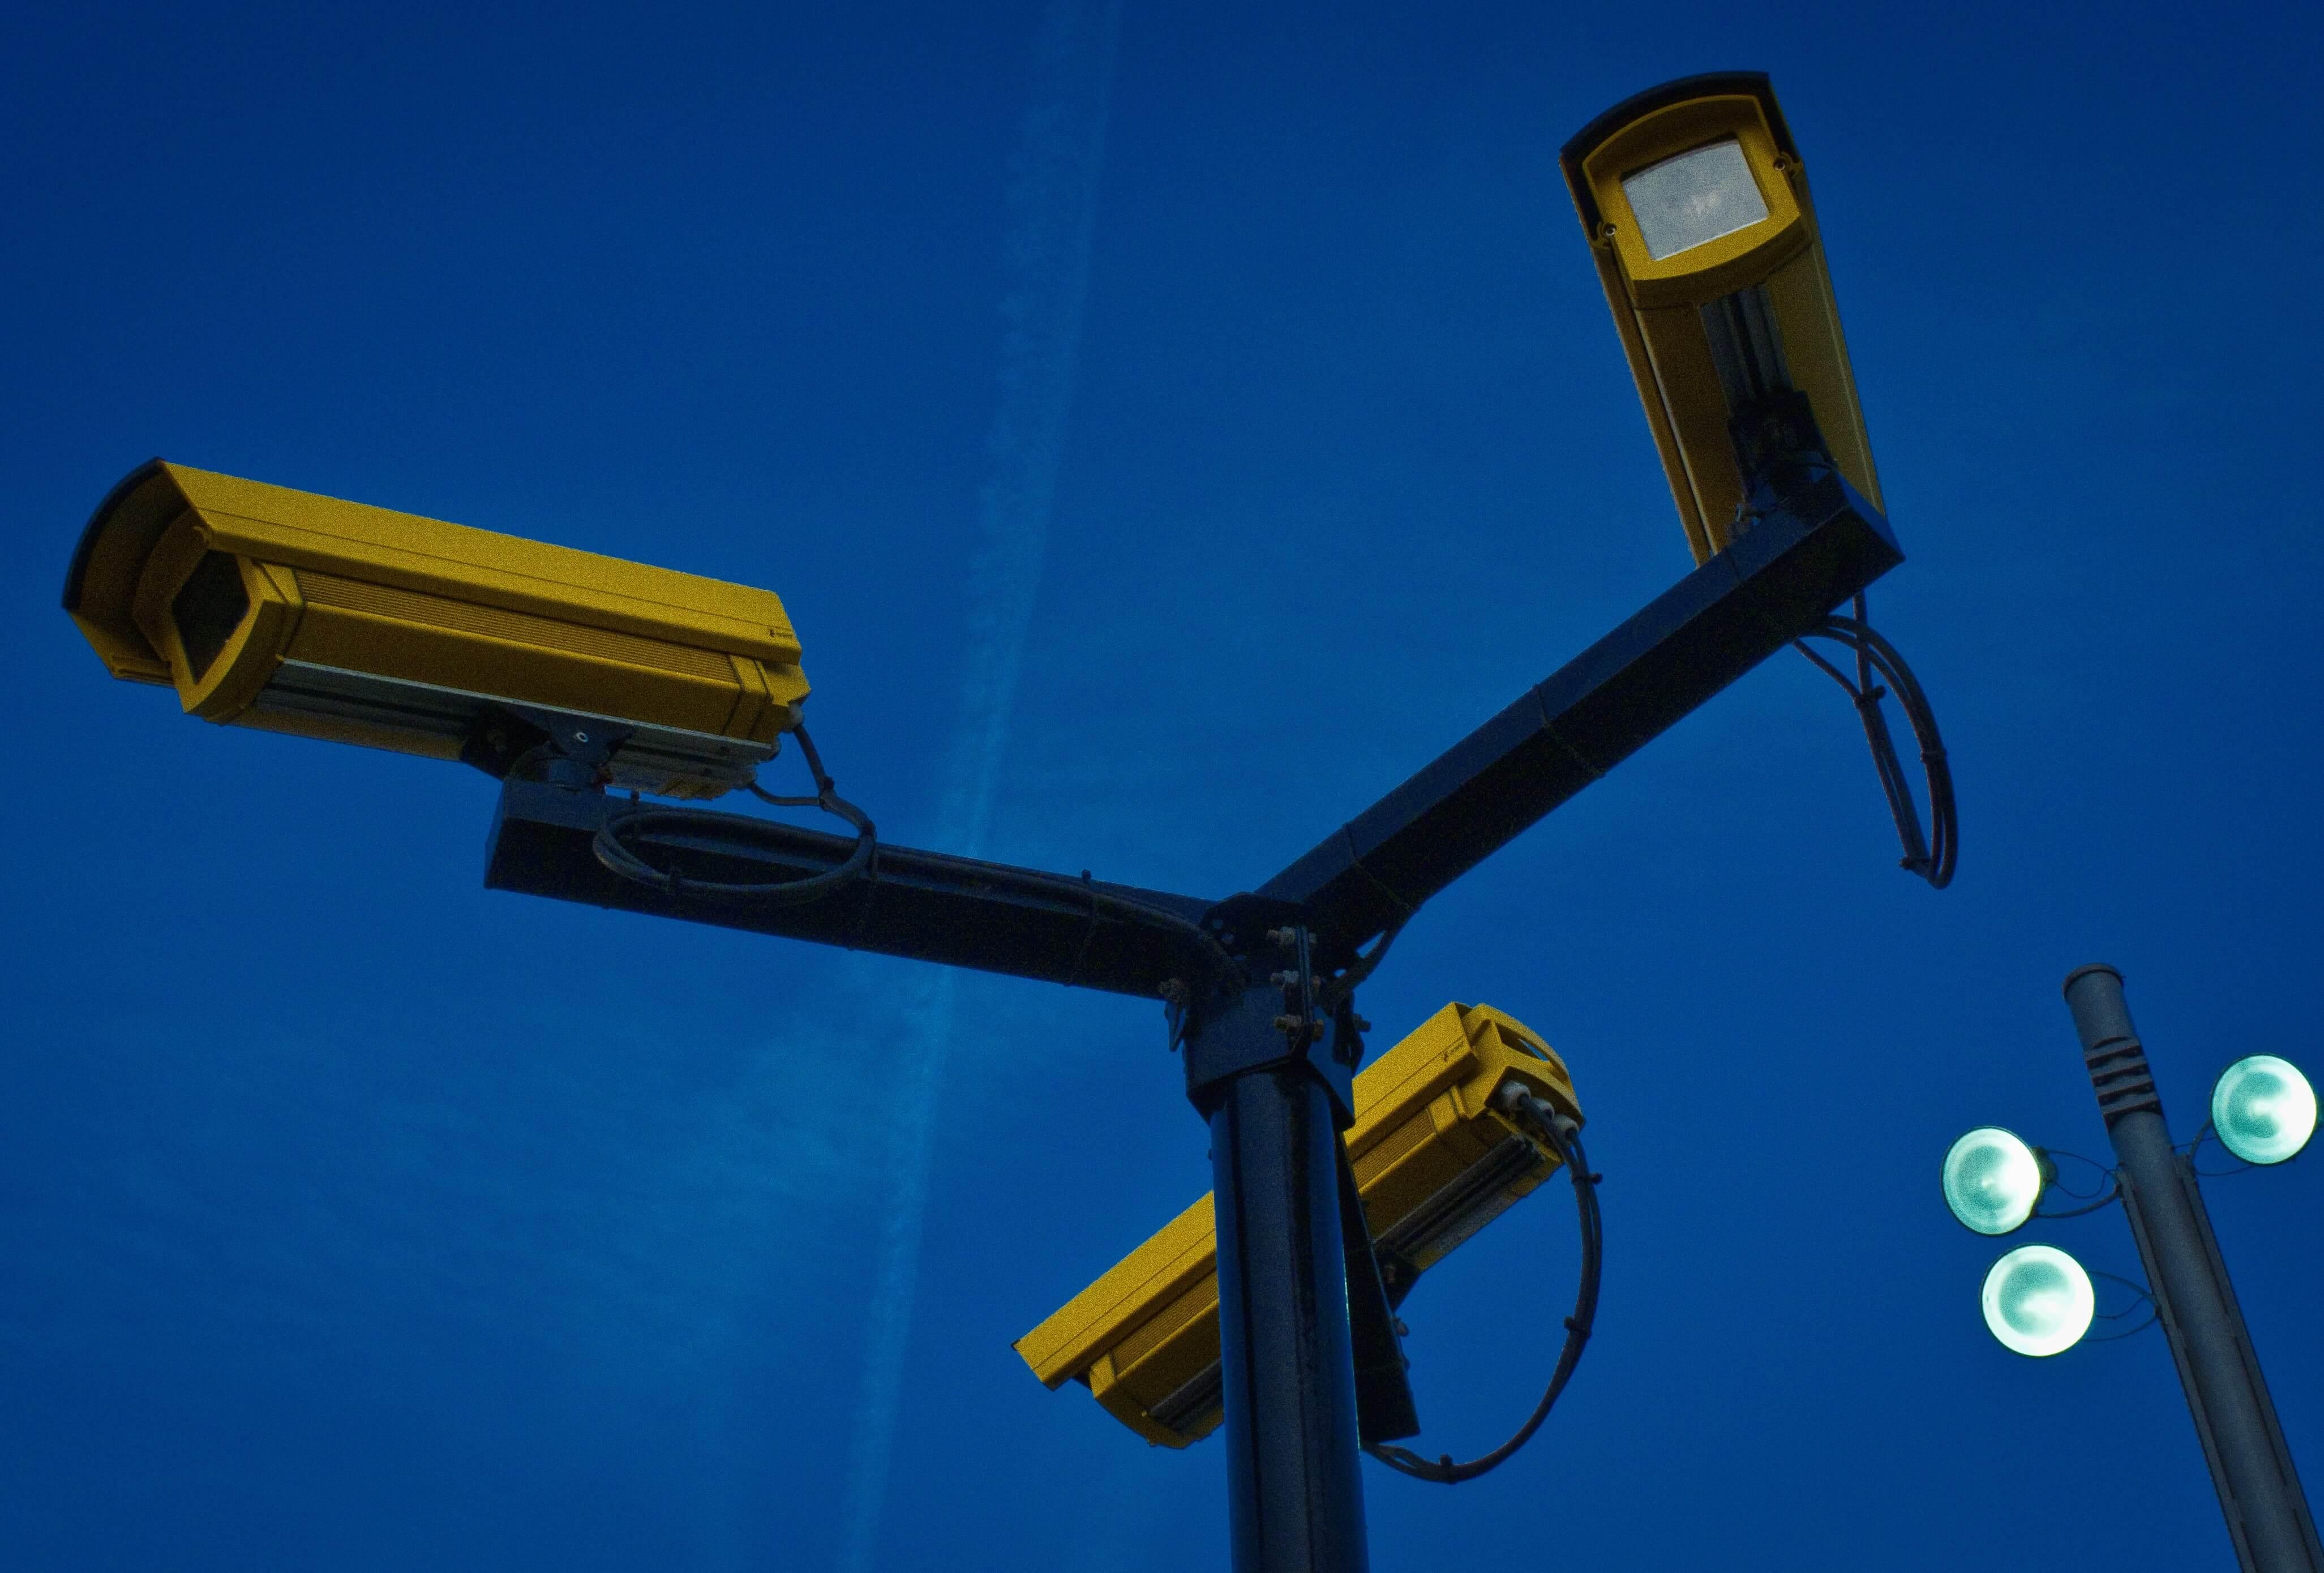 Day and night CCTV camera